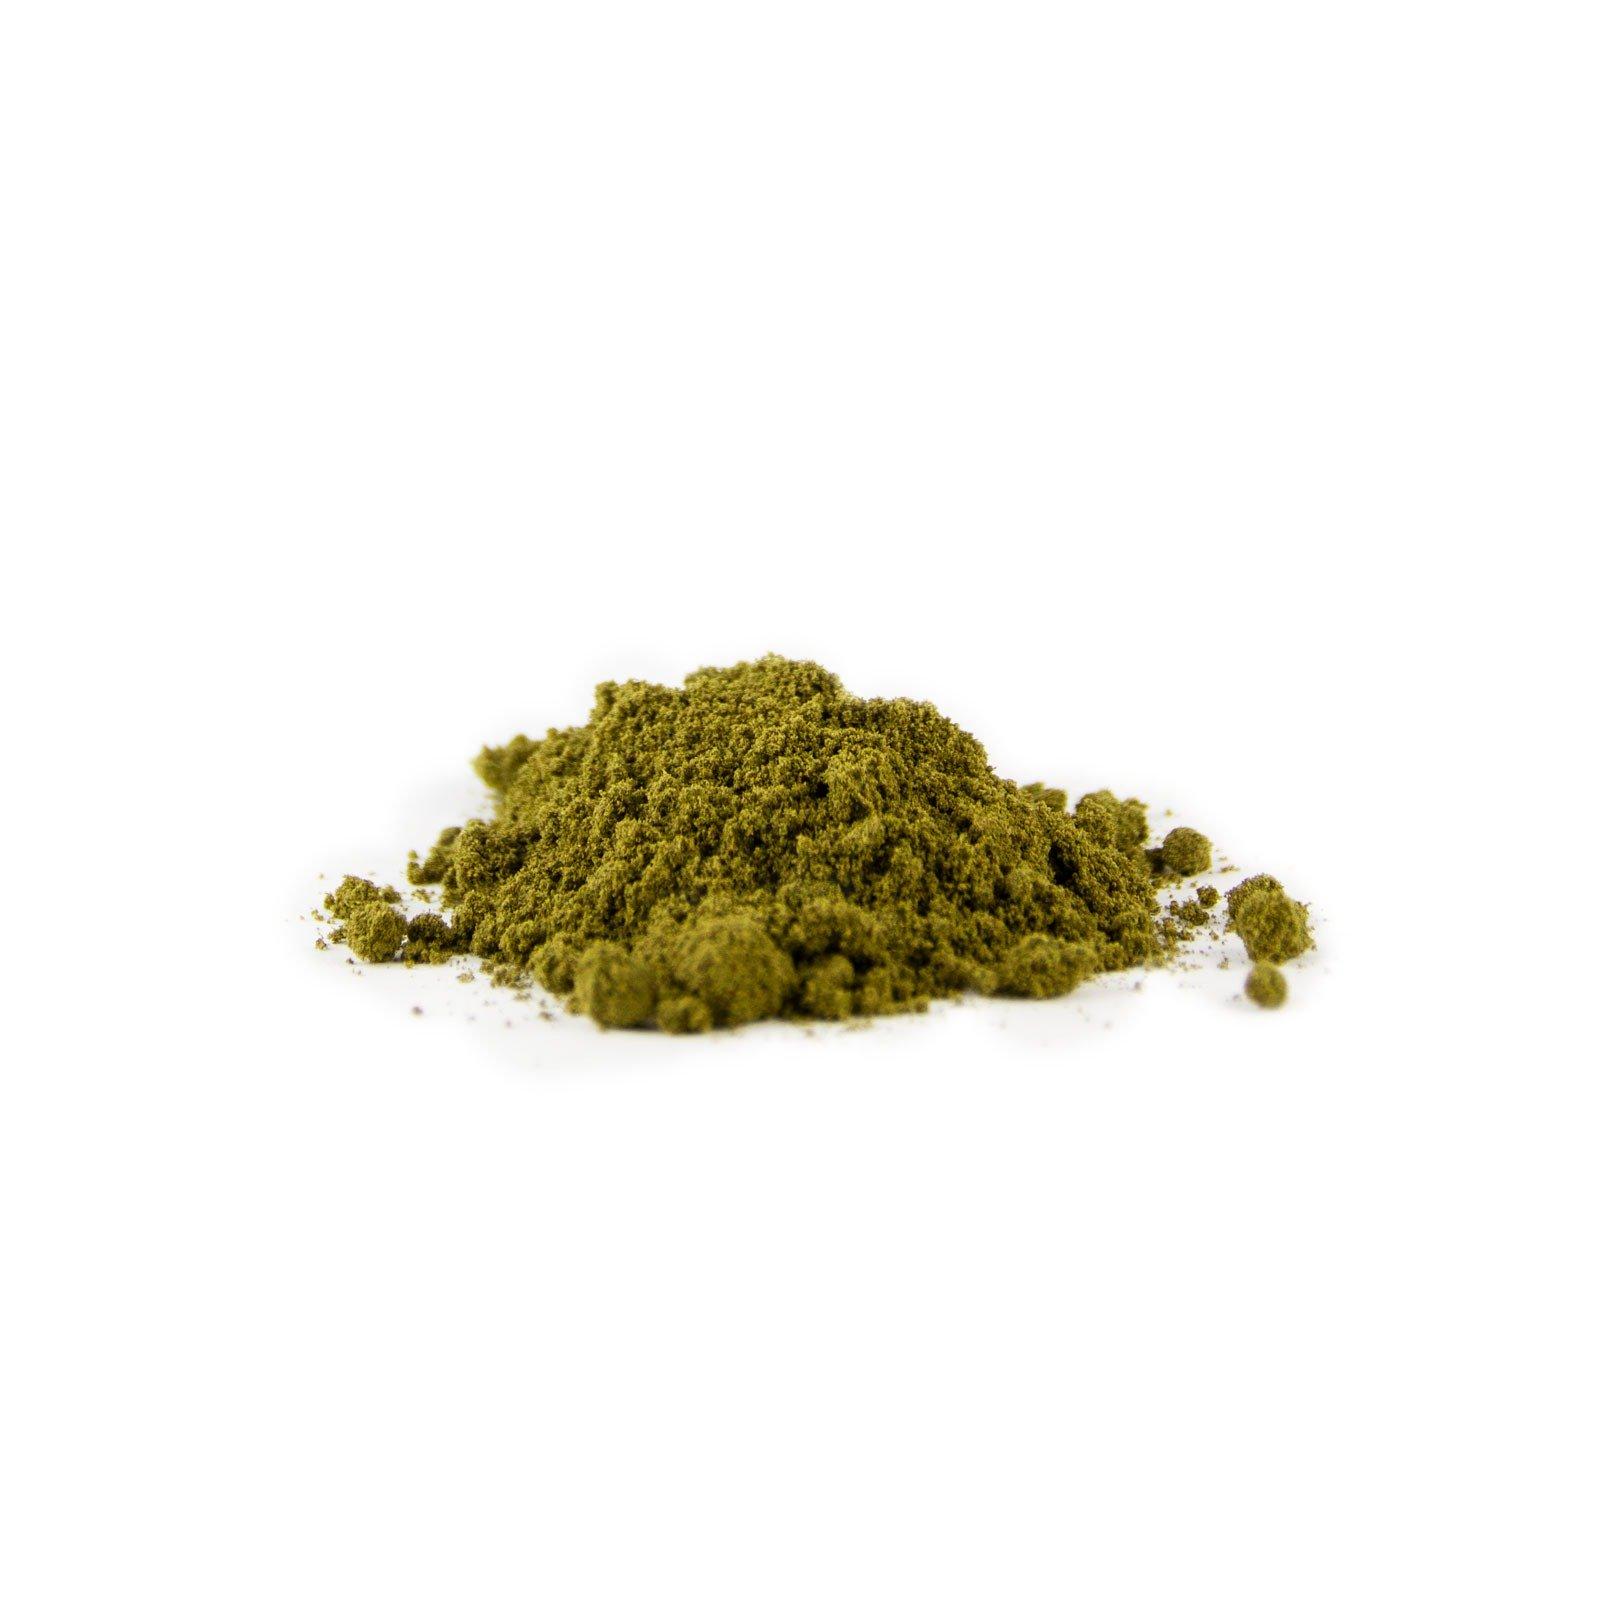 Image de variété Pollen Vert de Cannabis CBD 100% légal